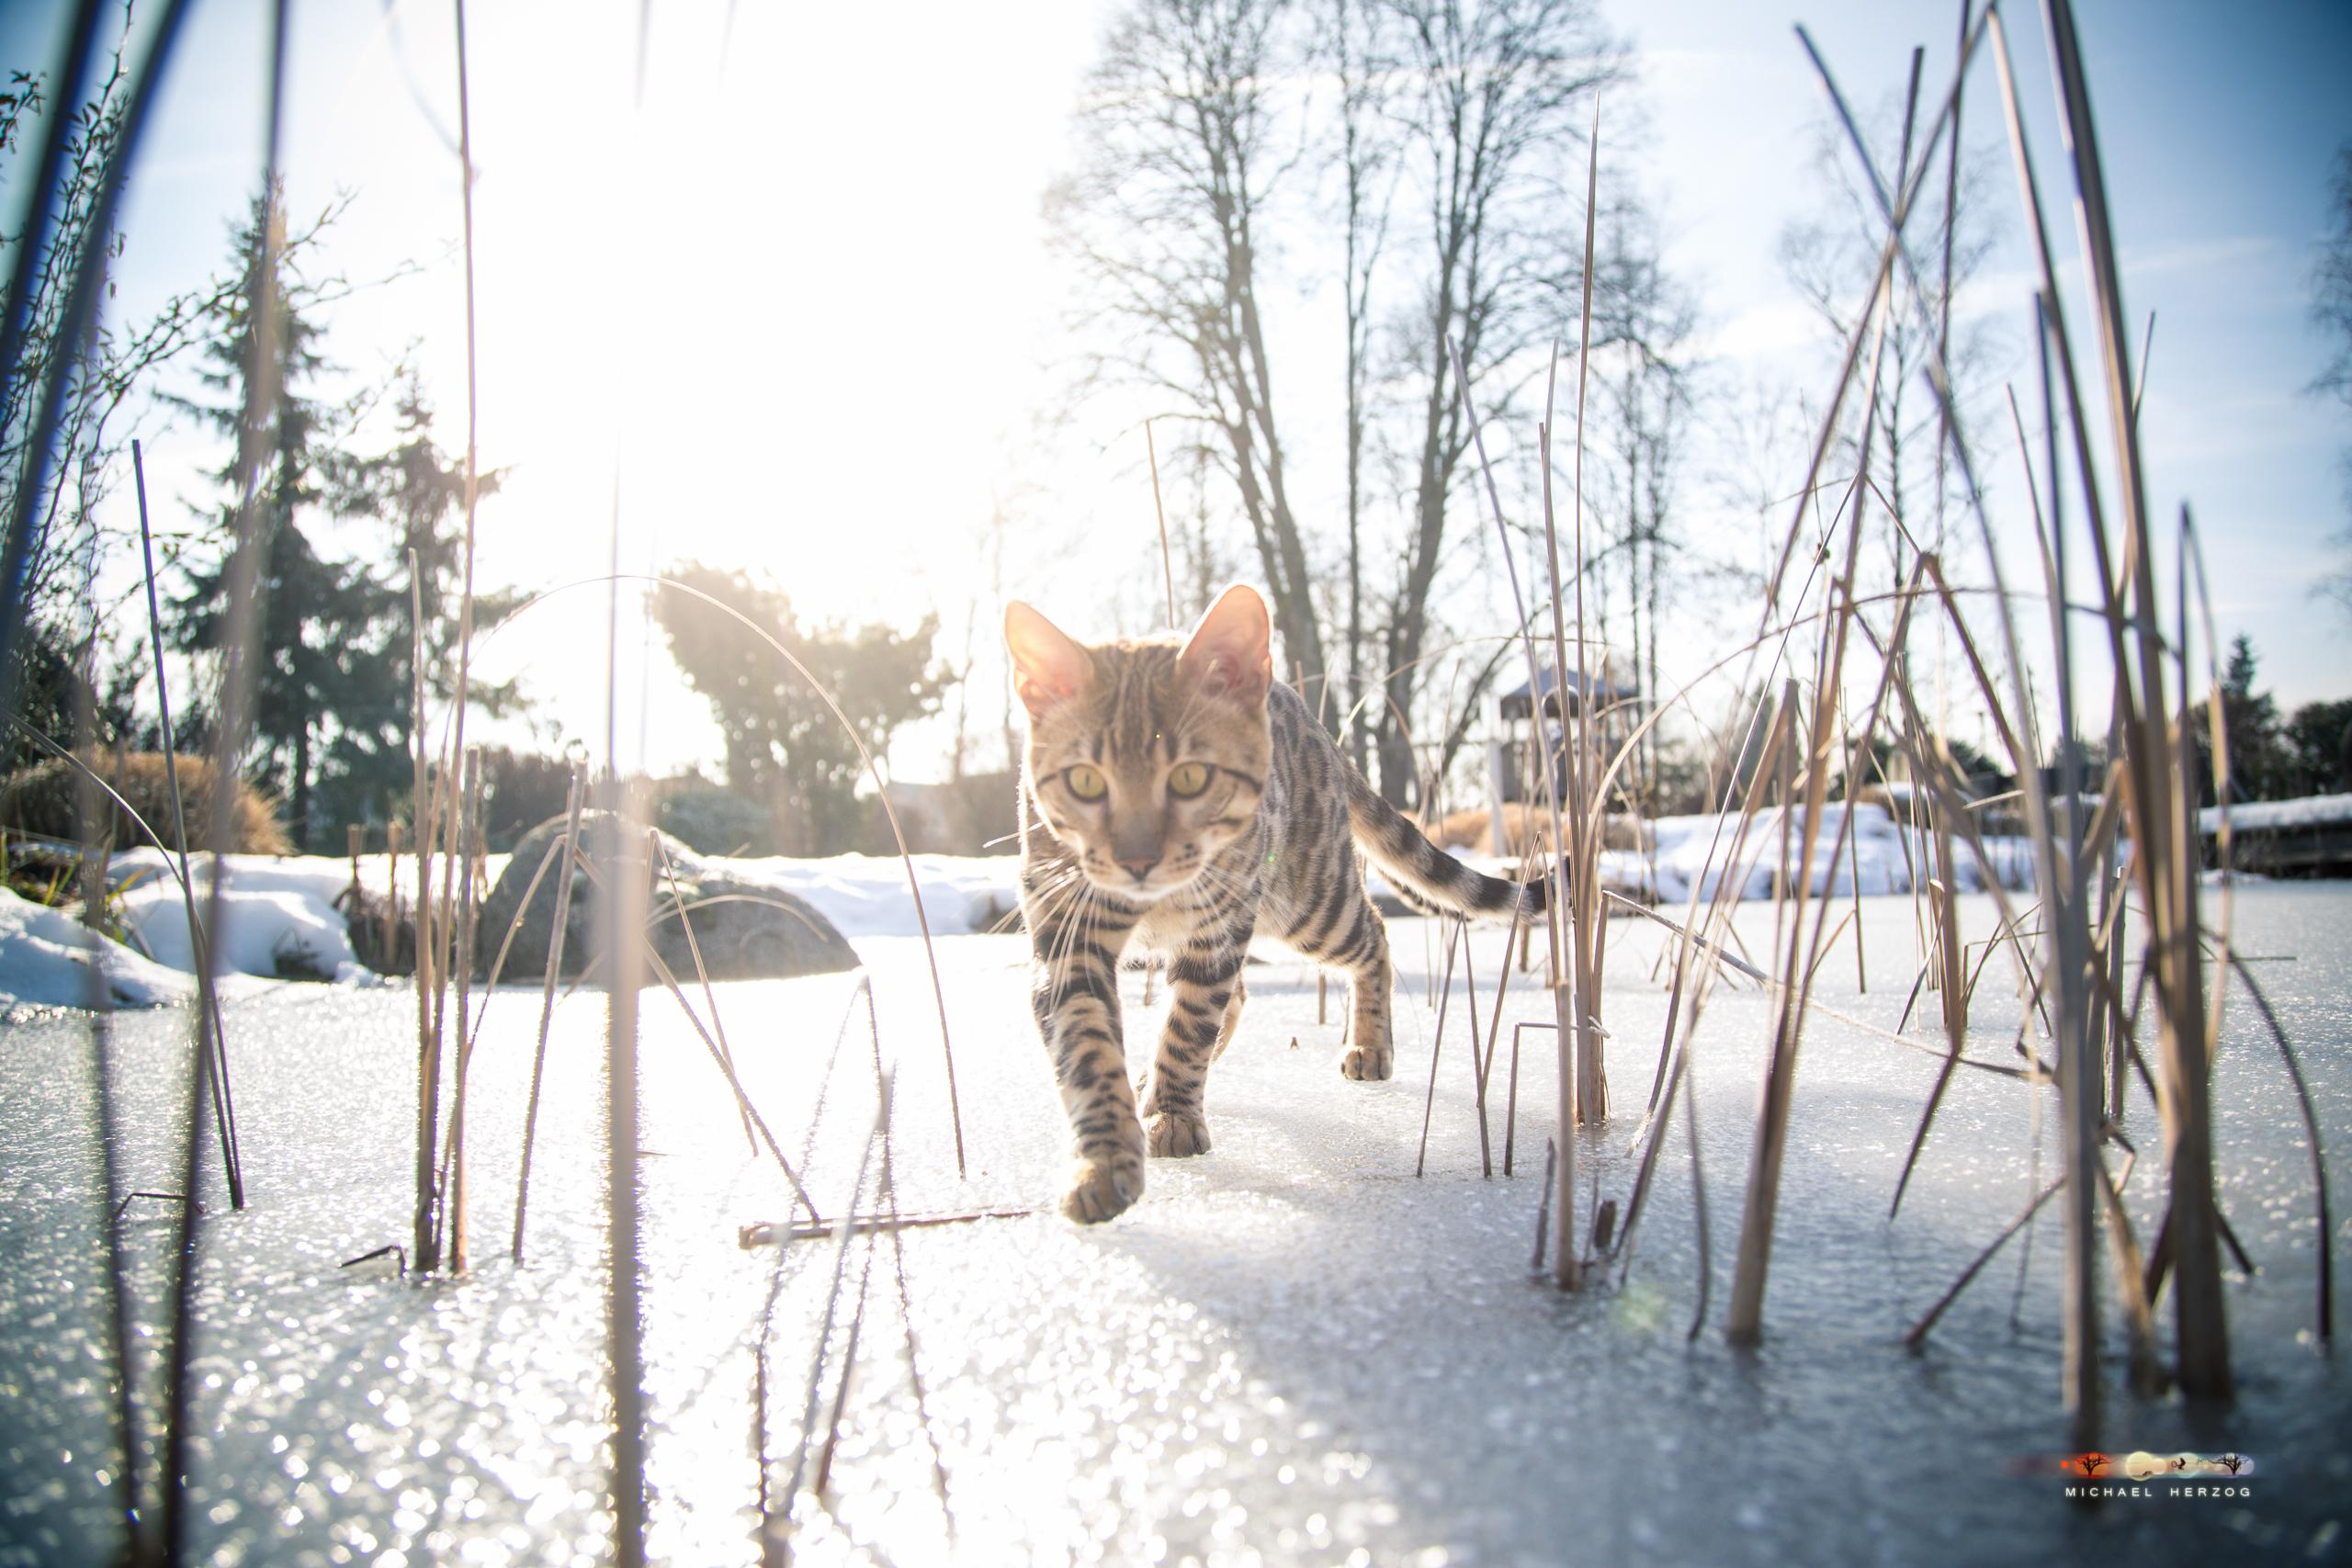 BALUARI_Winter2019_Garten_MichaelHerzog-8675.jpg